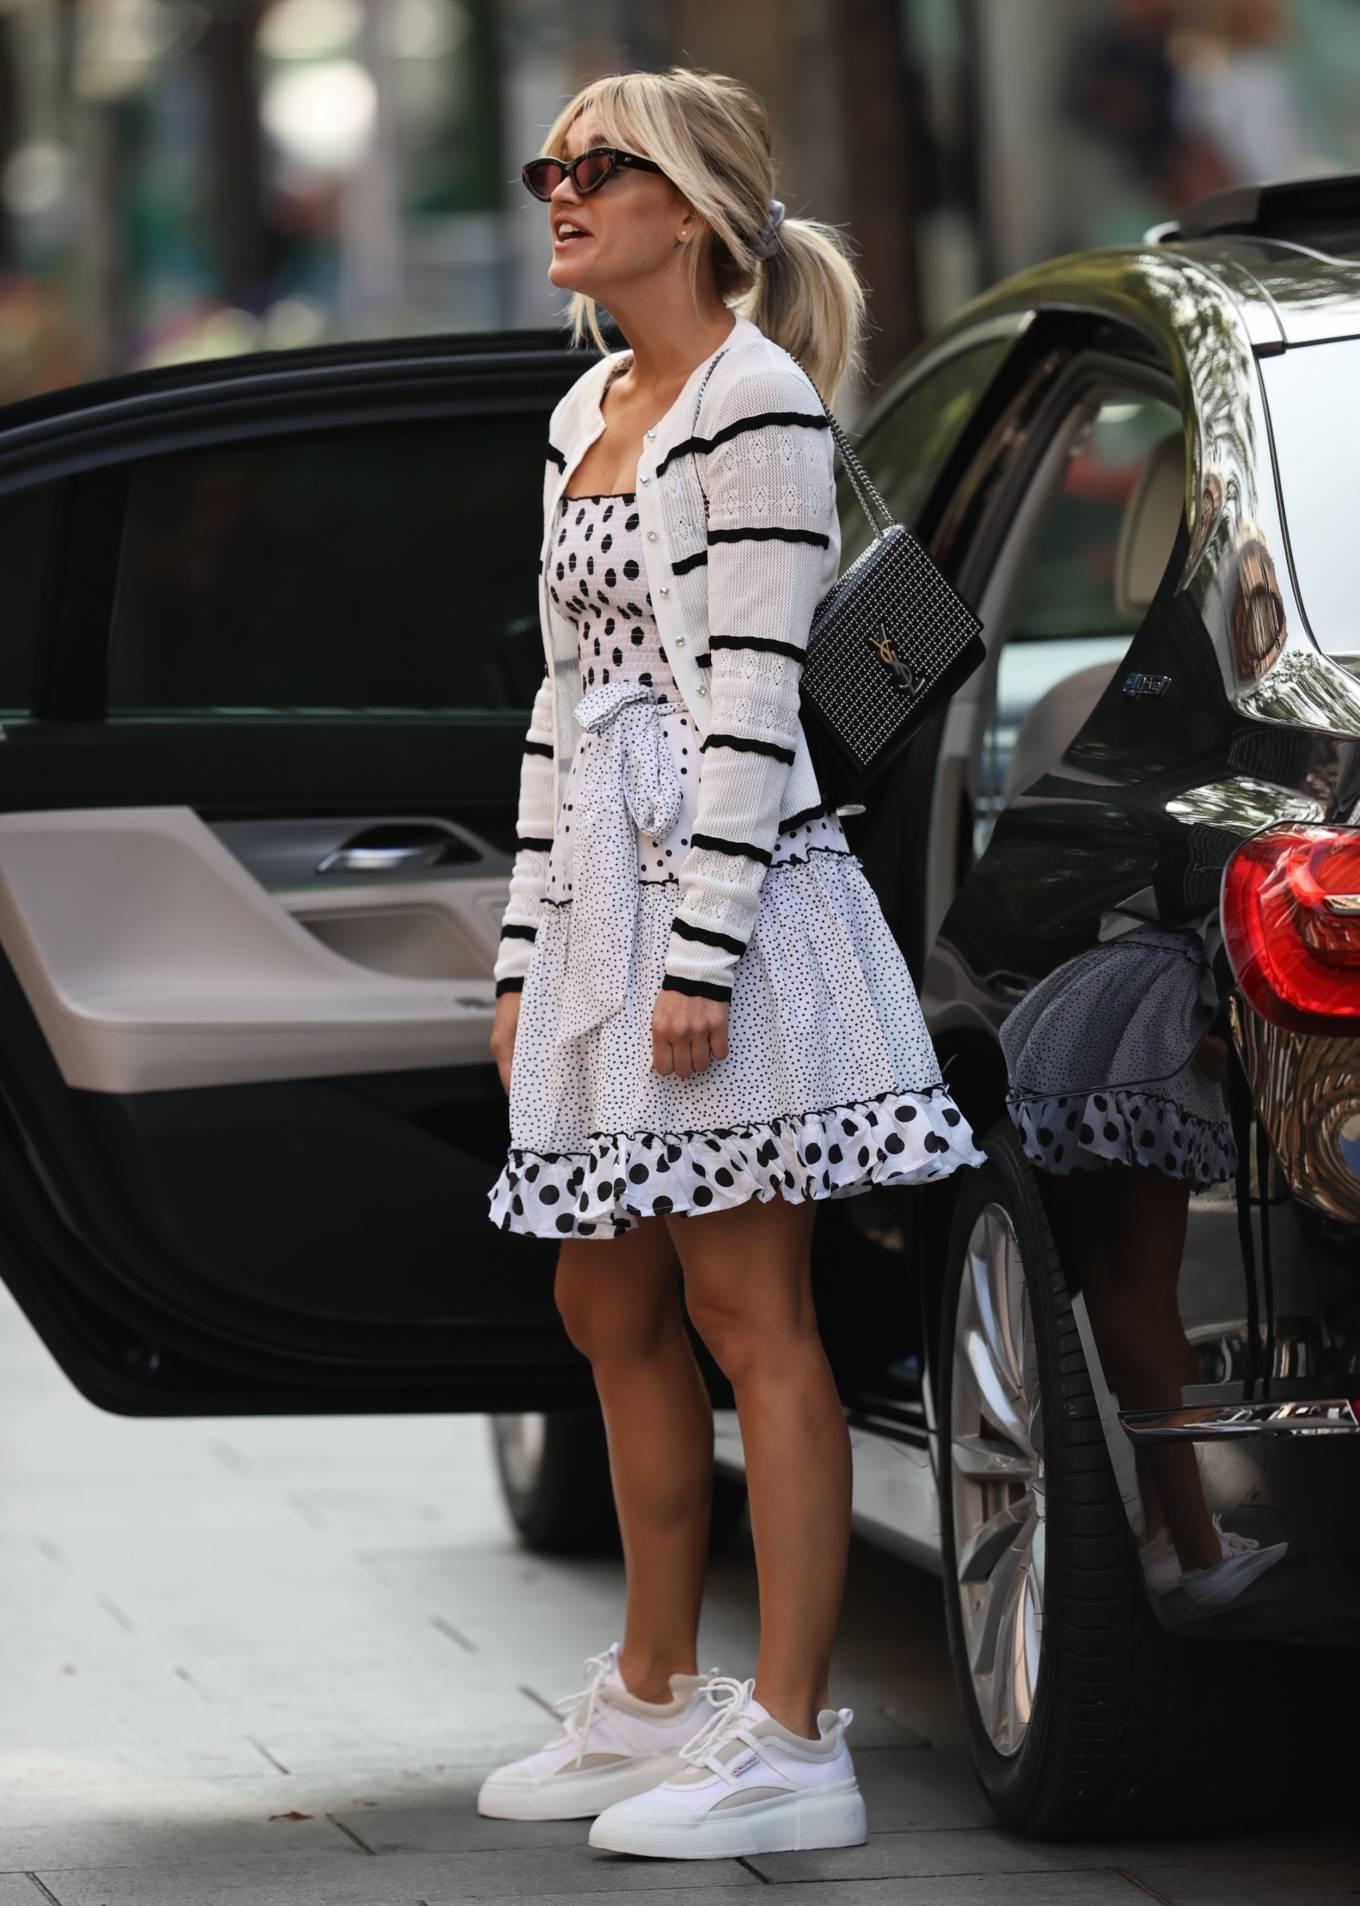 Ashley Roberts 2020 : Ashley Roberts – Wears White Polka Dot dress in London-16